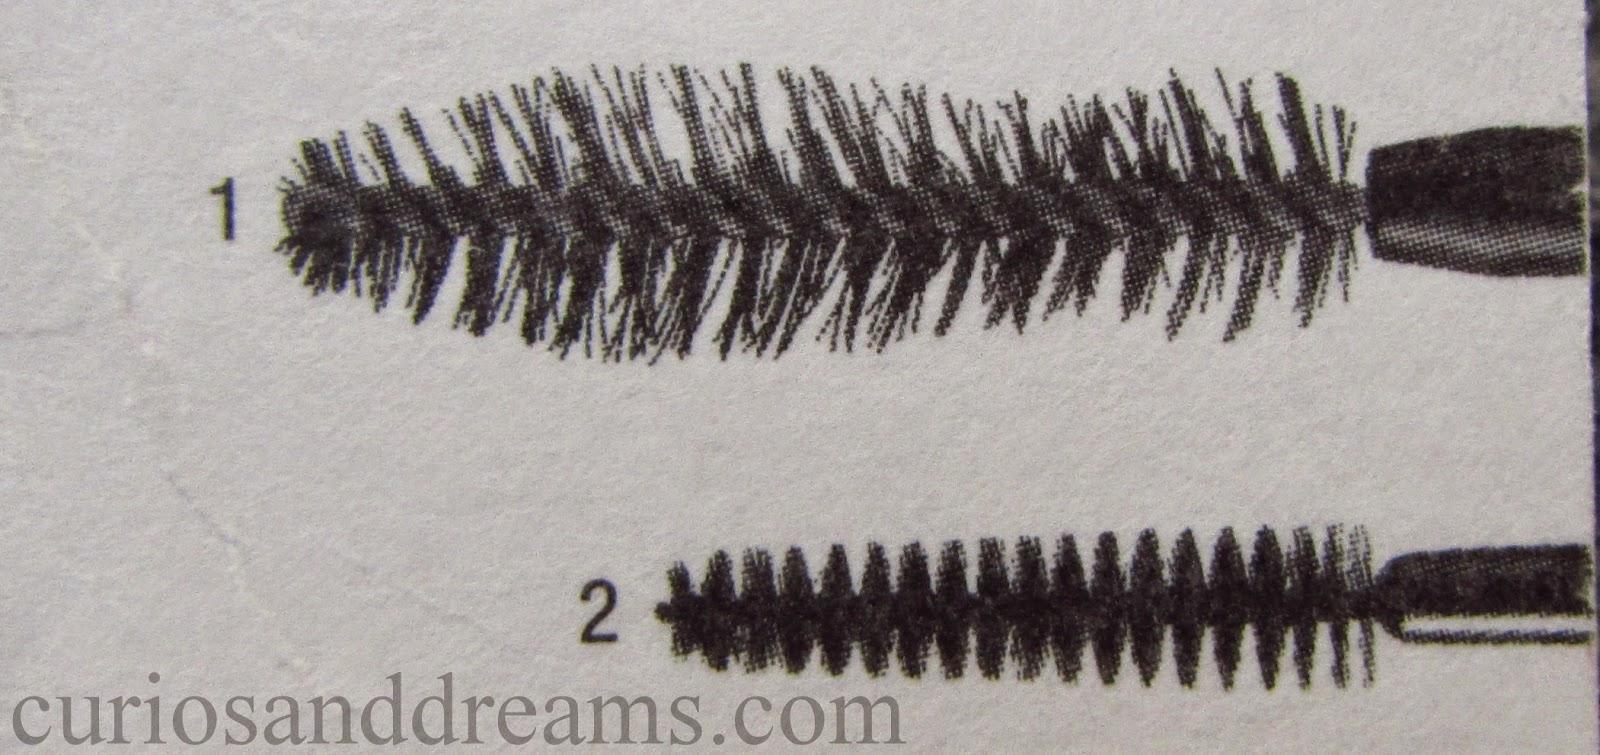 Maybelline The Falsies Big Eyes Mascara, Maybelline The Falsies Big Eyes Mascara review, The Falsies Big Eyes Mascara review